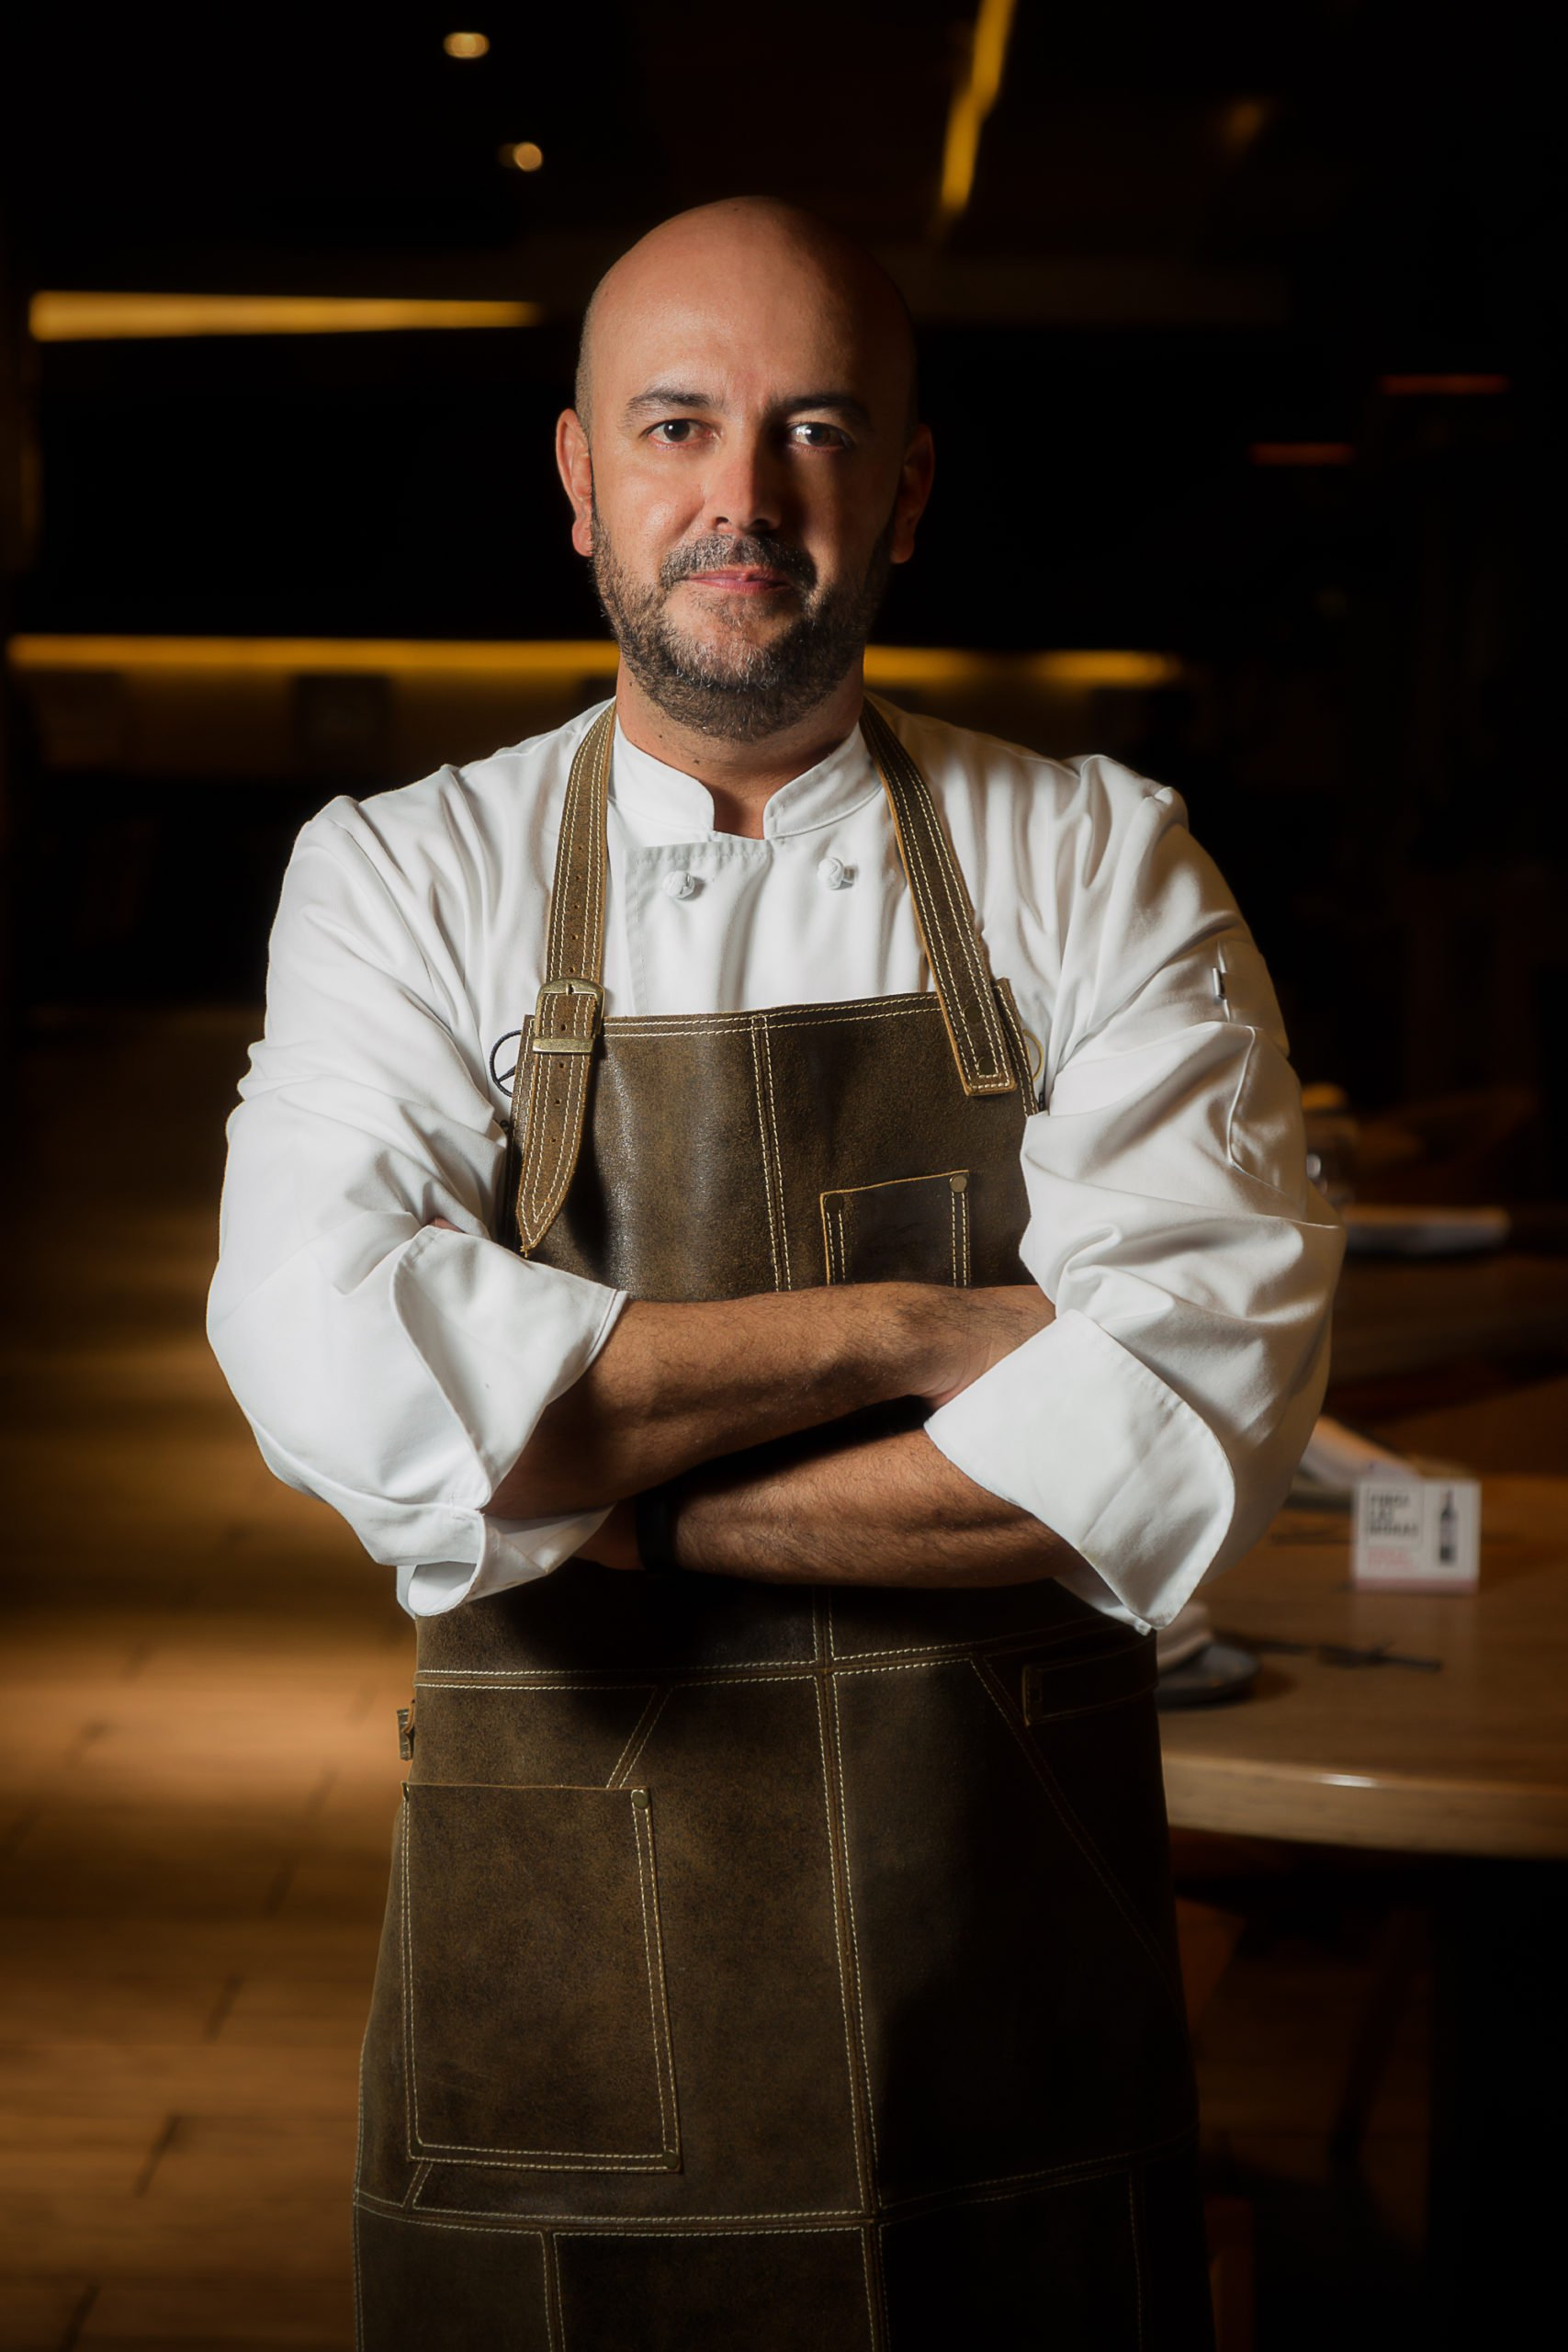 ¿Sin saber que cocinarle a mamá? Diego Panesso sugiere Unión Festival Ceviche tibio de trucha, piña, y chorizo santarrosano